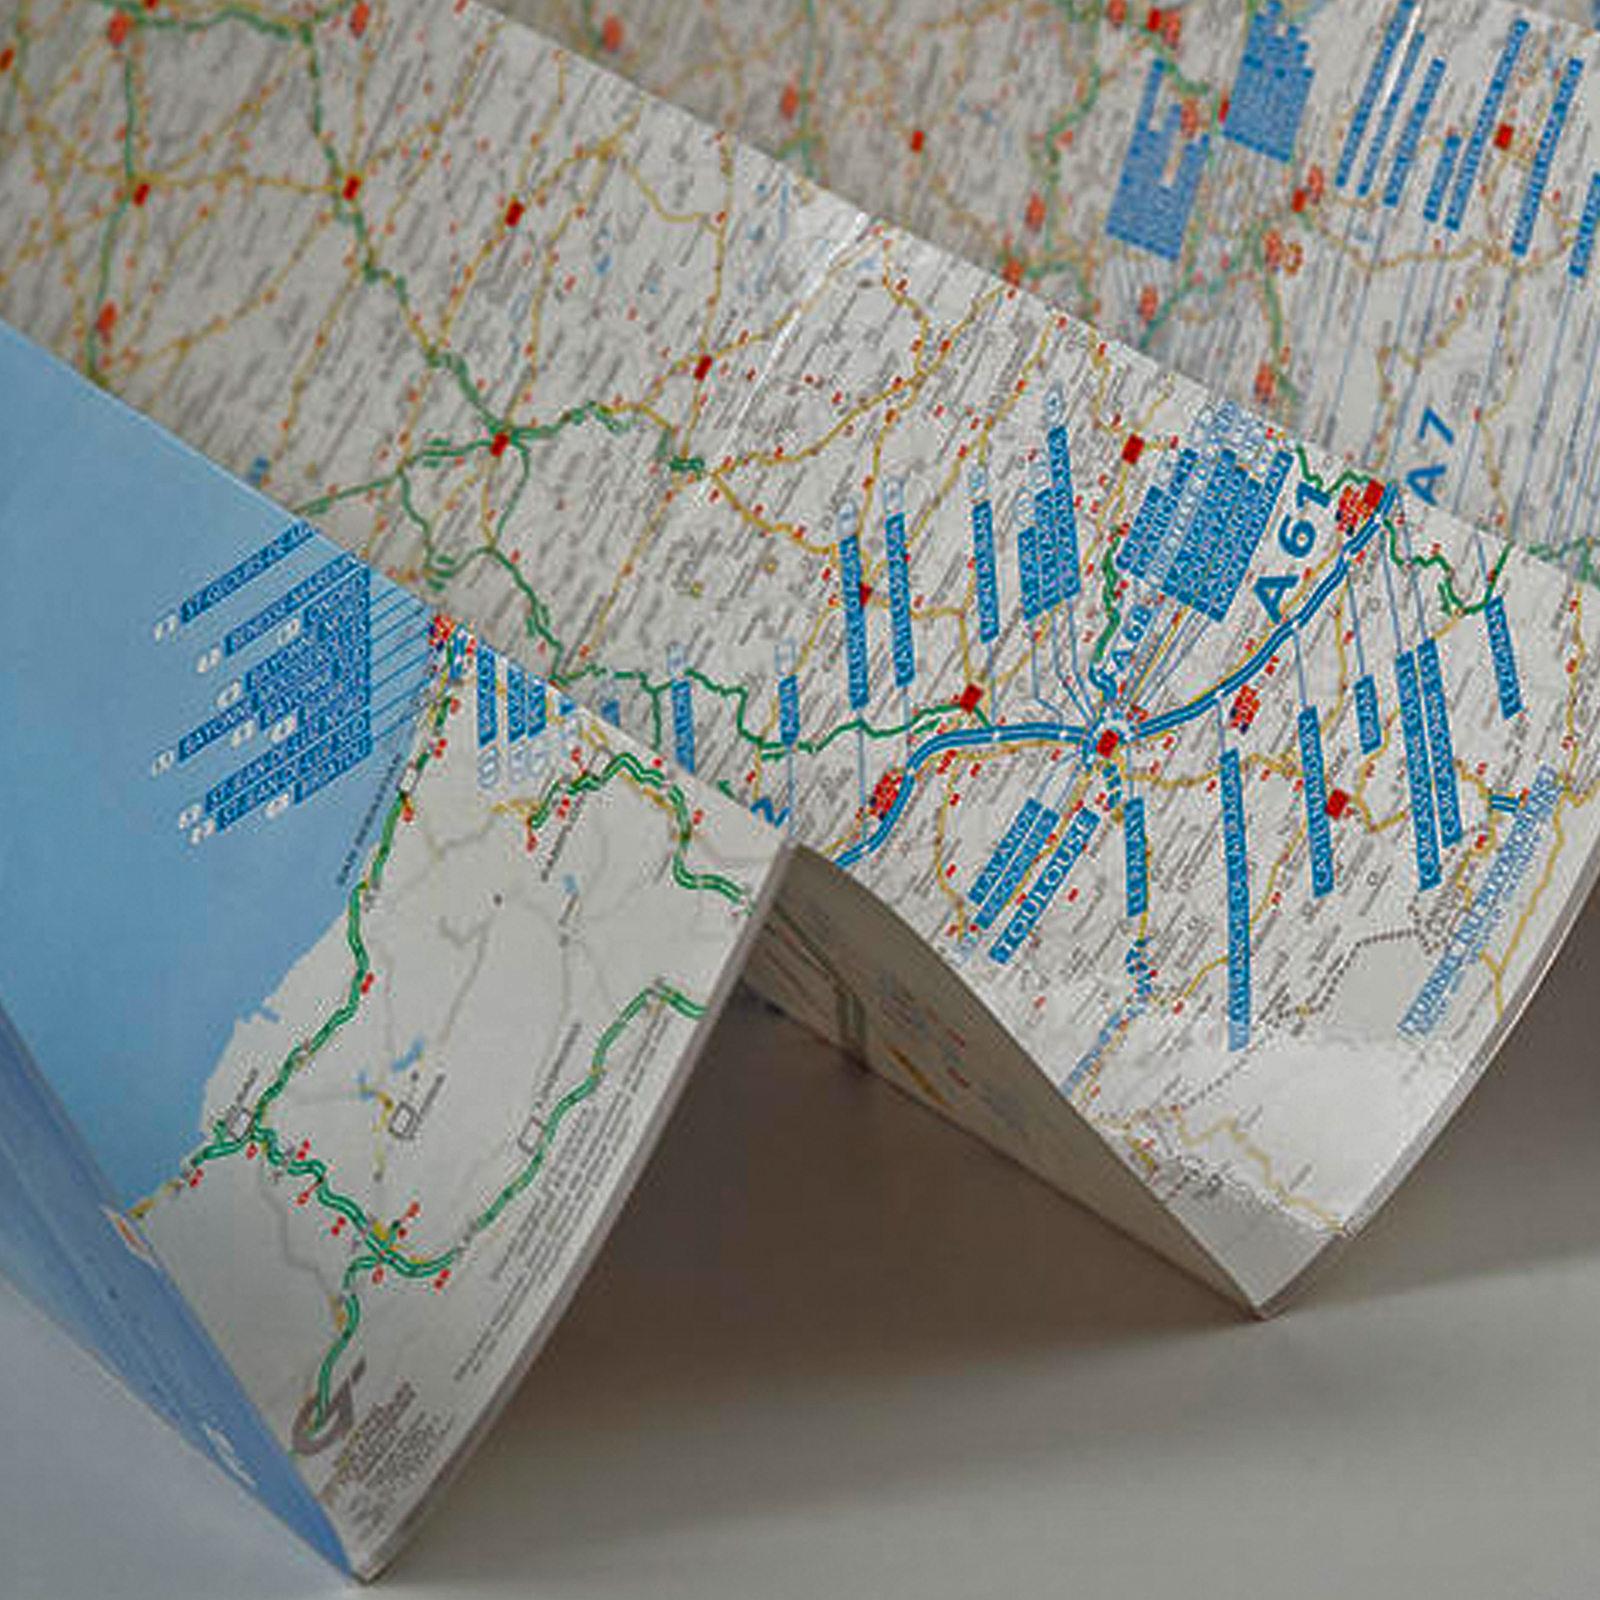 Filmomatt One Side Self Adhesive Cadmium Matt Transparent - Colourless world map